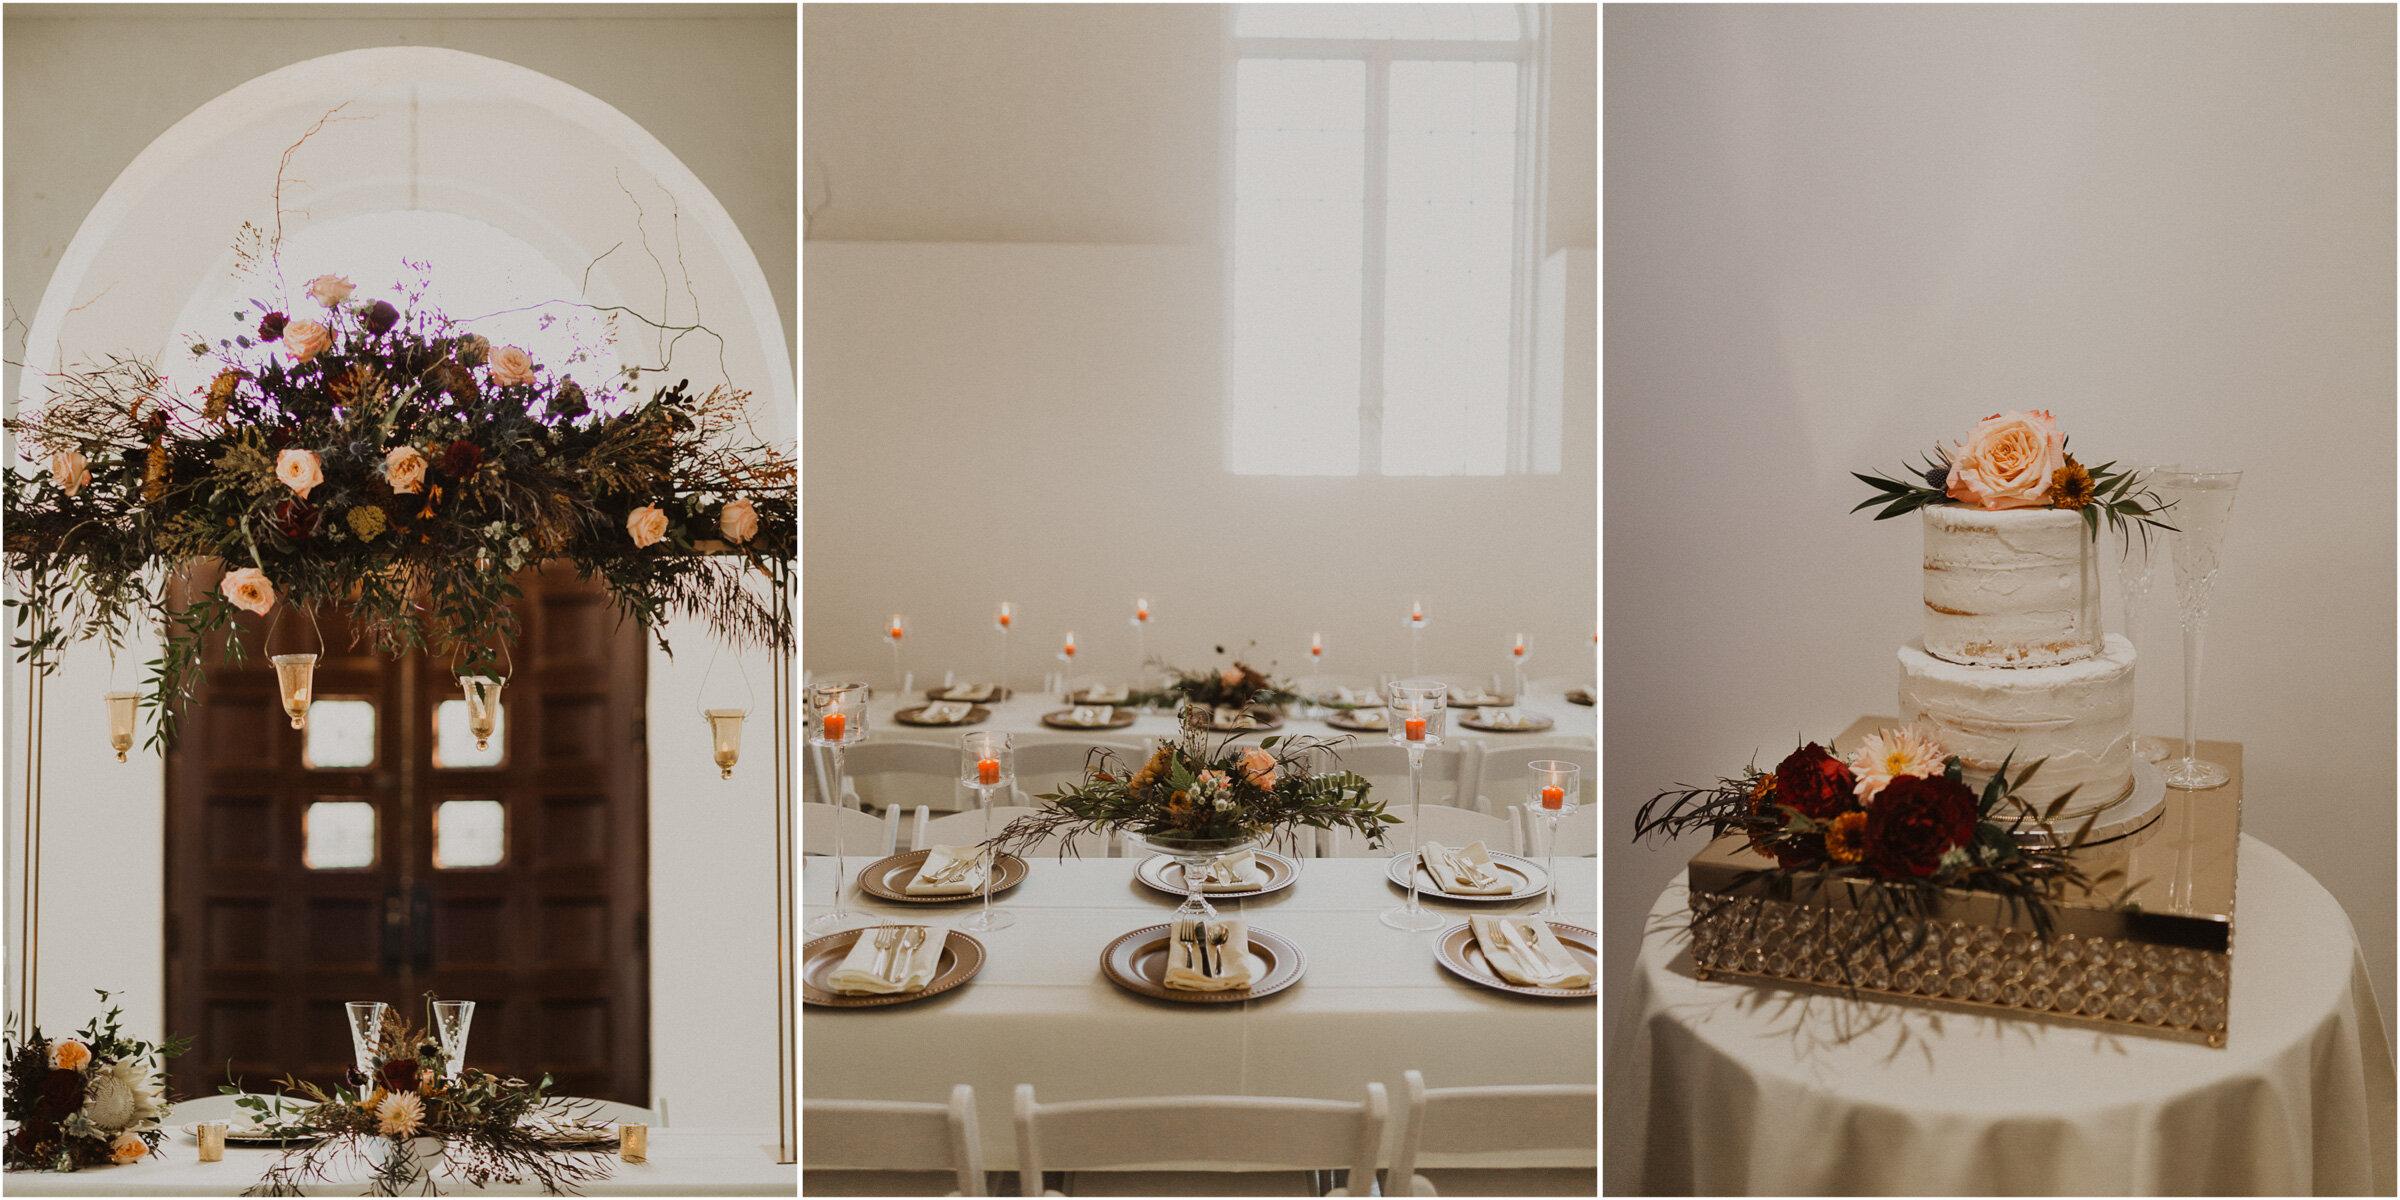 alyssa barletter photography la villa kansas city patio wedding sarah seven wedding dress-41.jpg